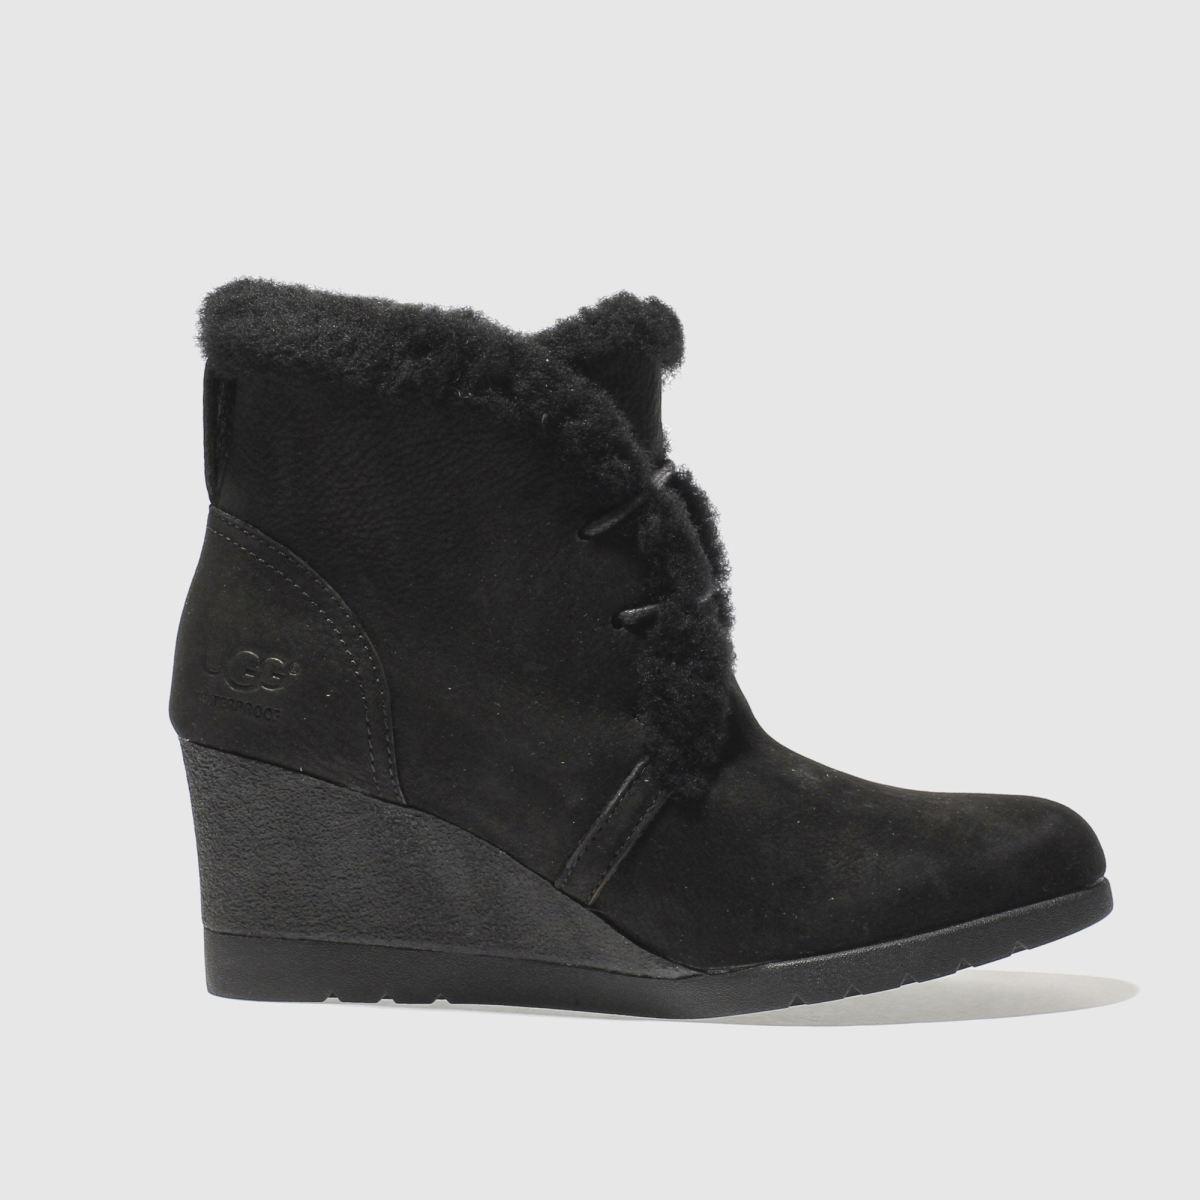 Ugg Black Jeovana Boots